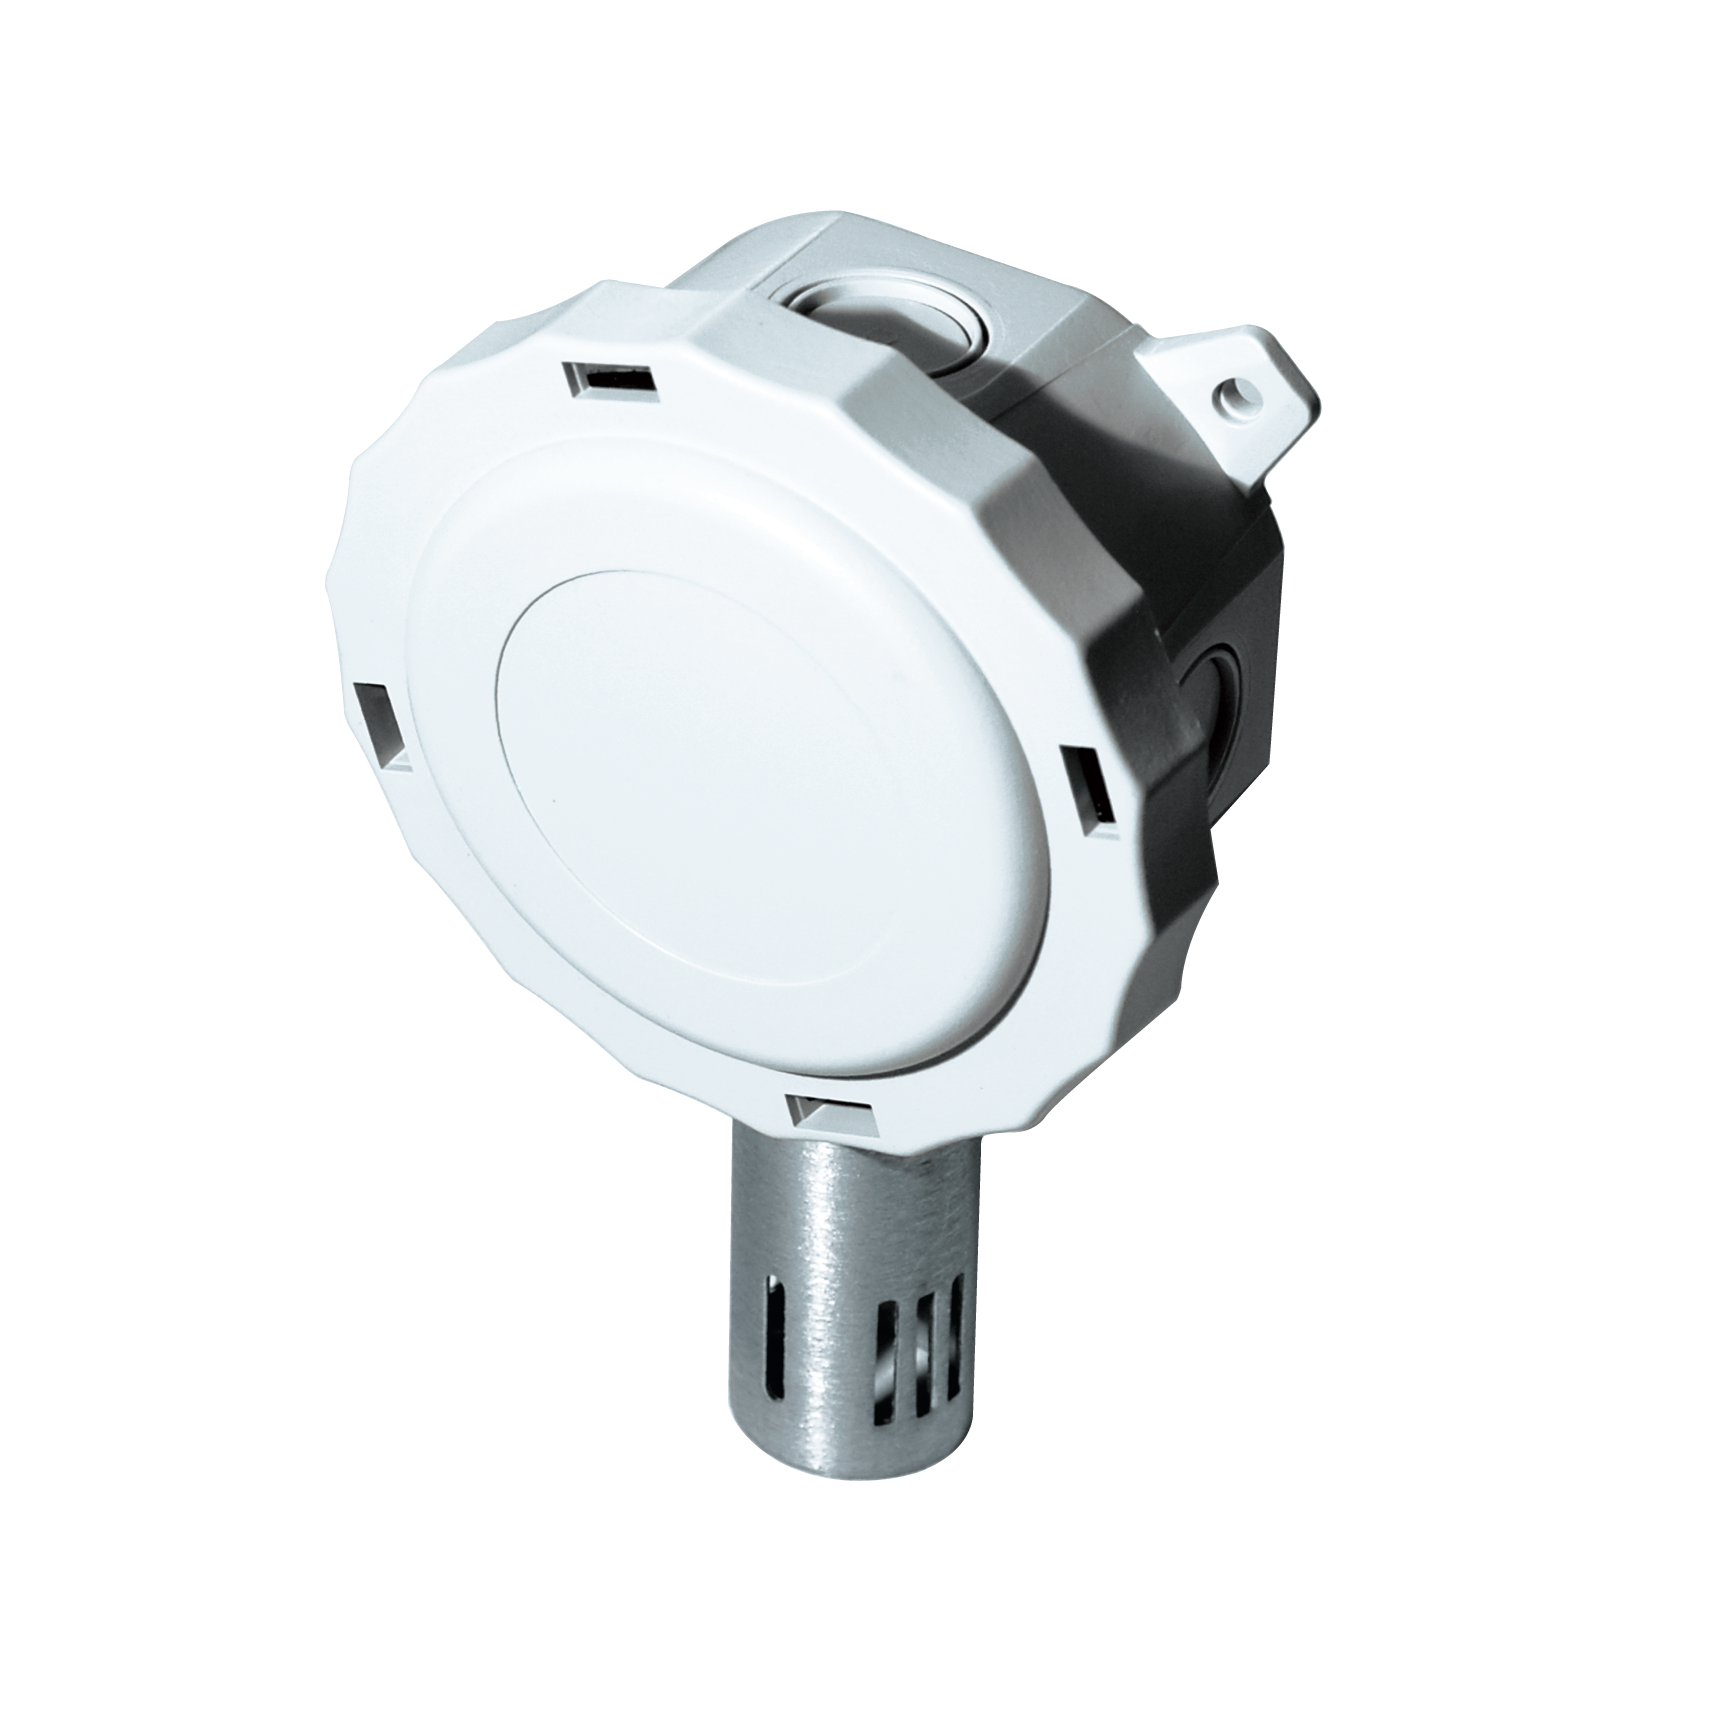 ACI A/RH3-O-10 Humidity Transmitter